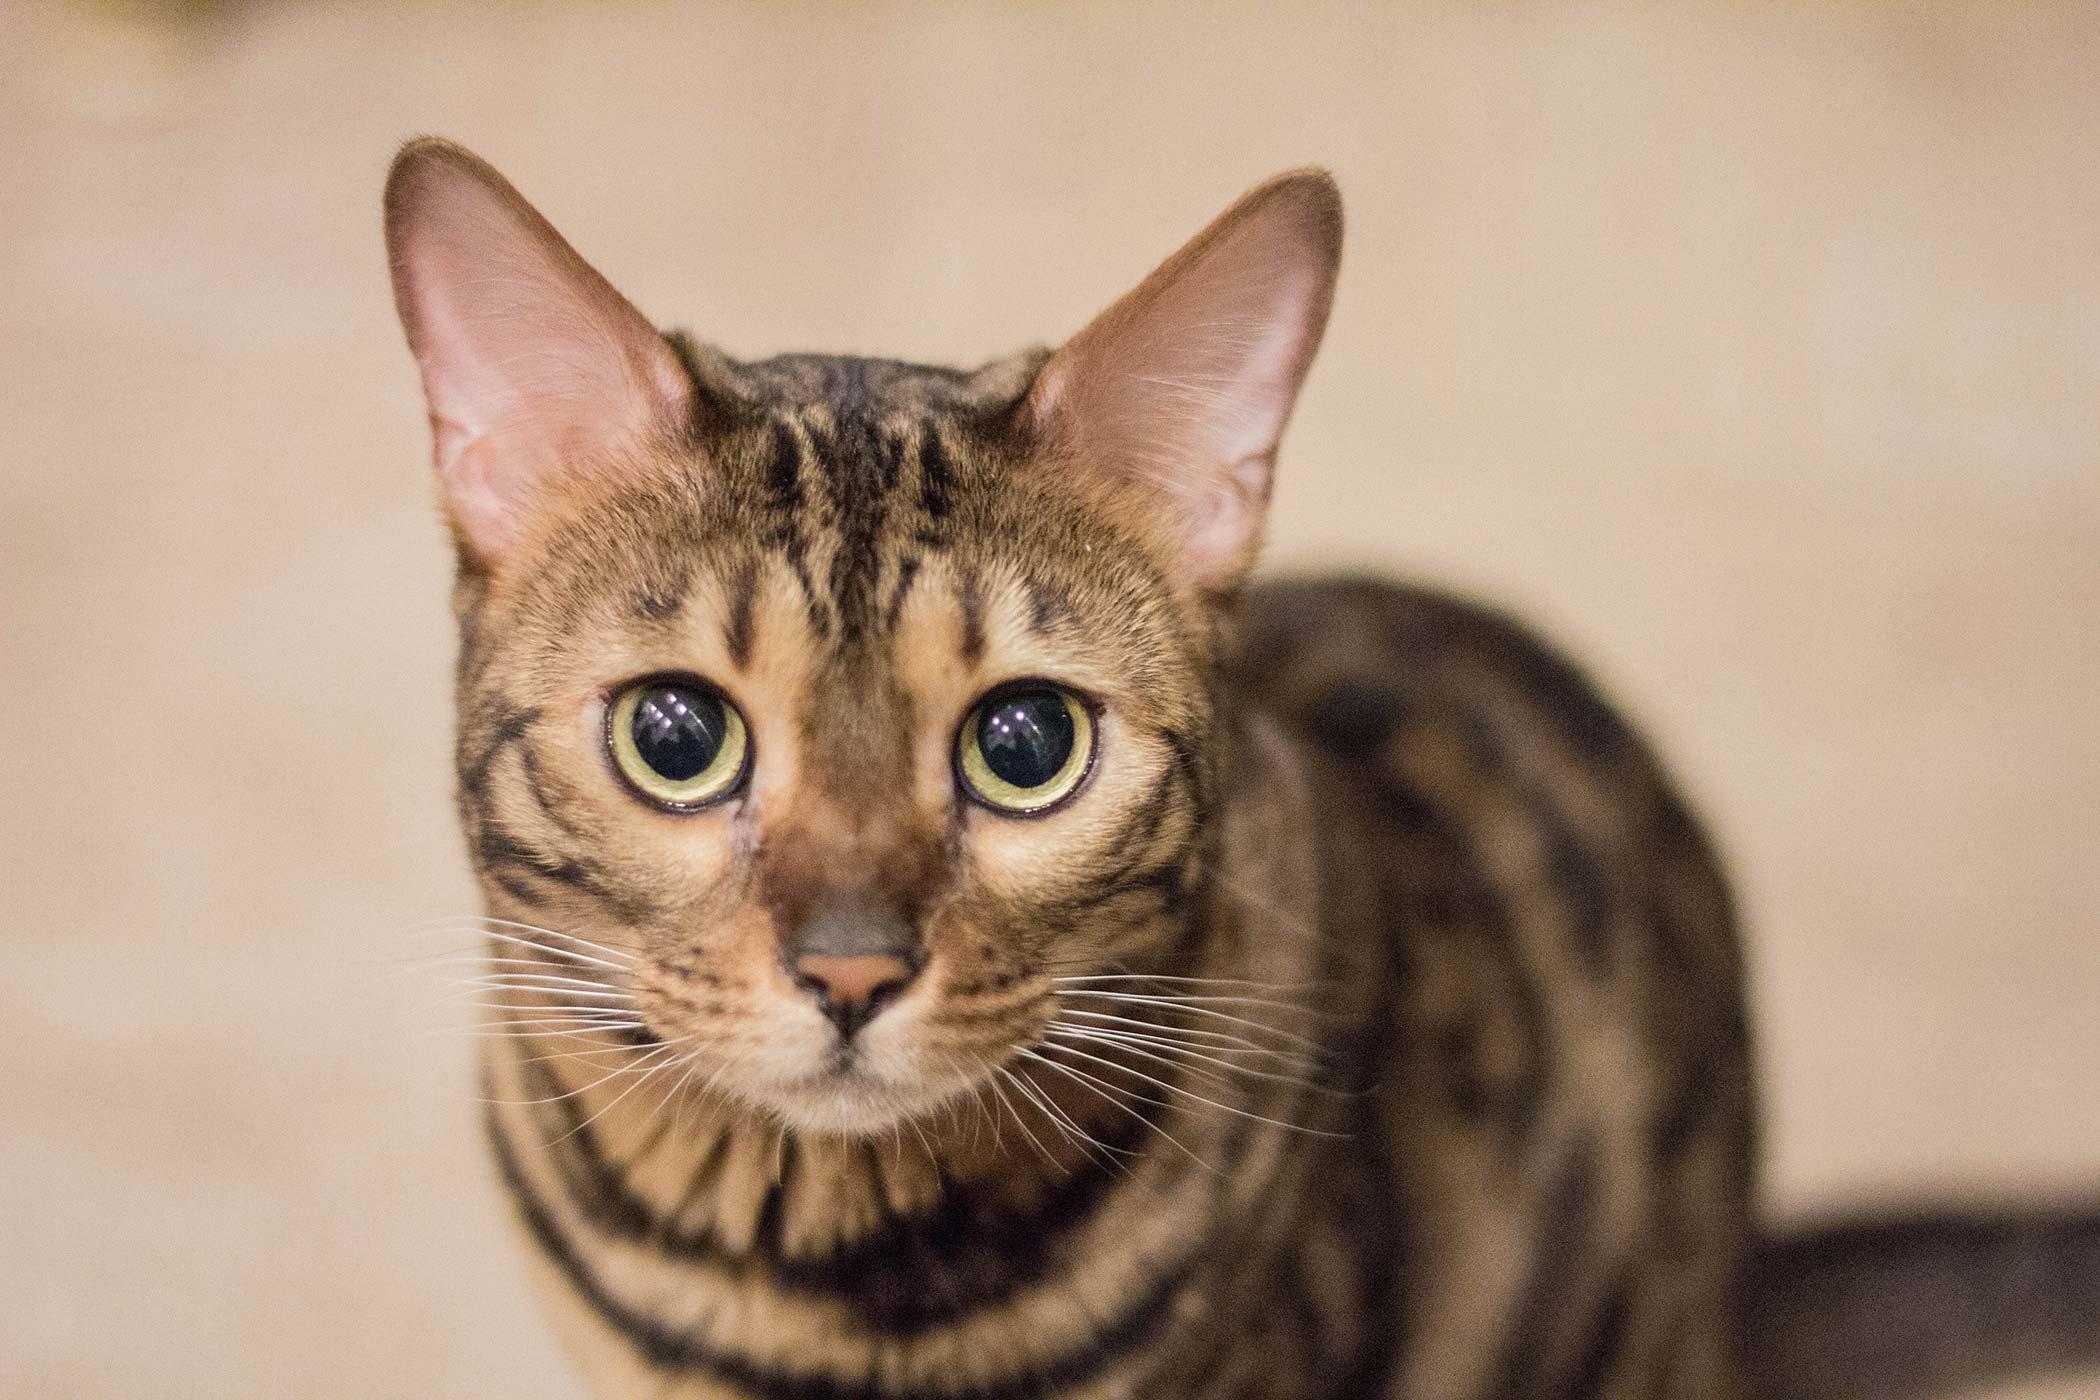 Degeneration of the Cornea in Cats